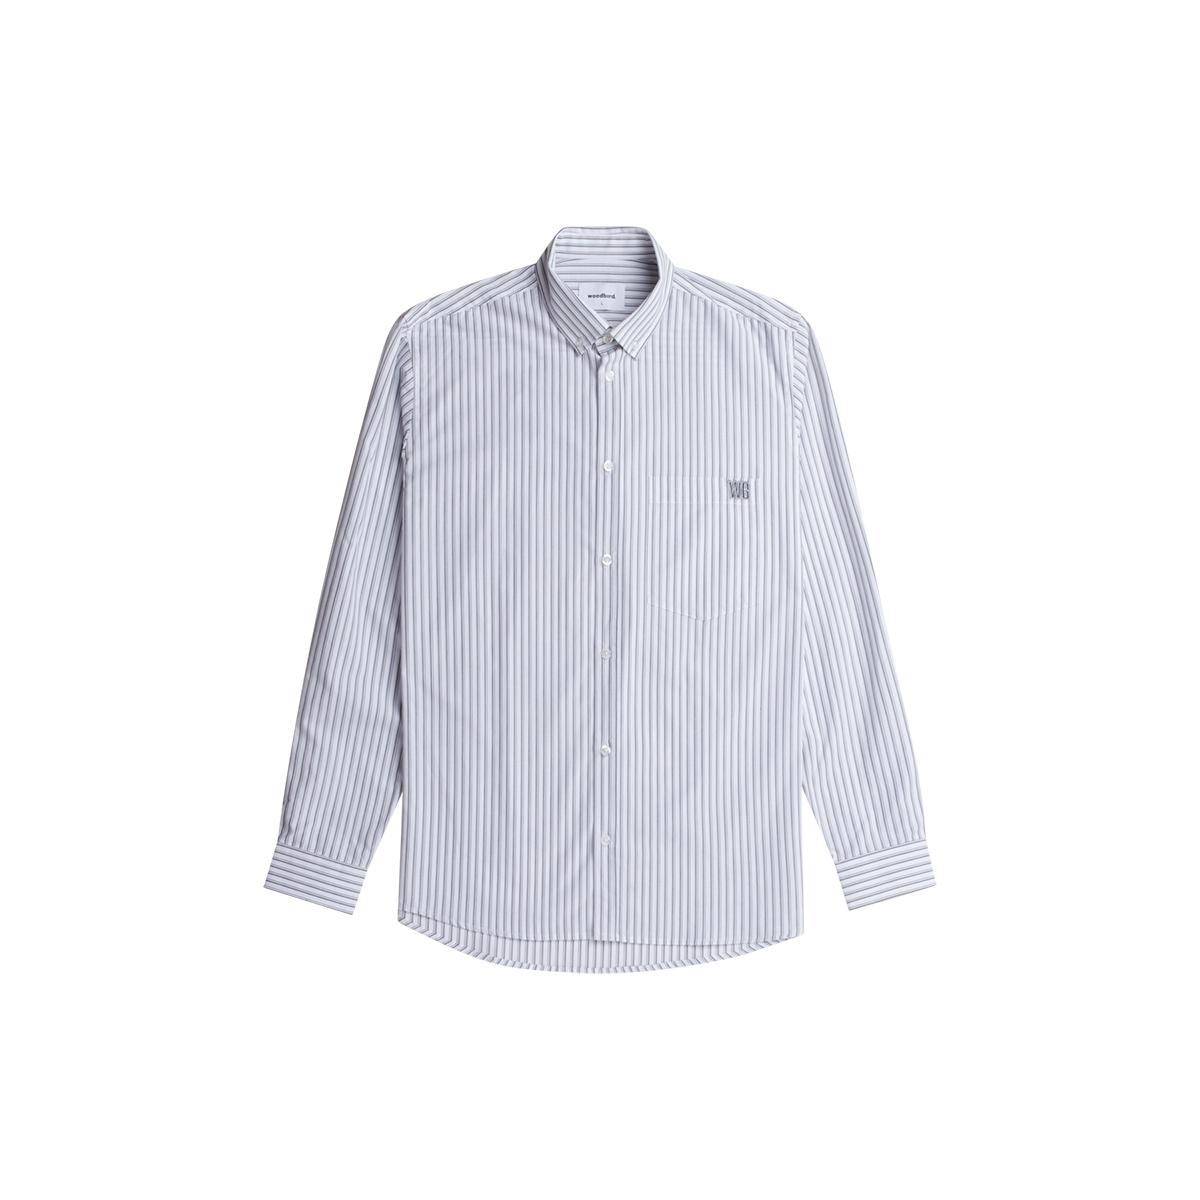 Woodbird Fling Stripe Skjorte, Light Grey, M